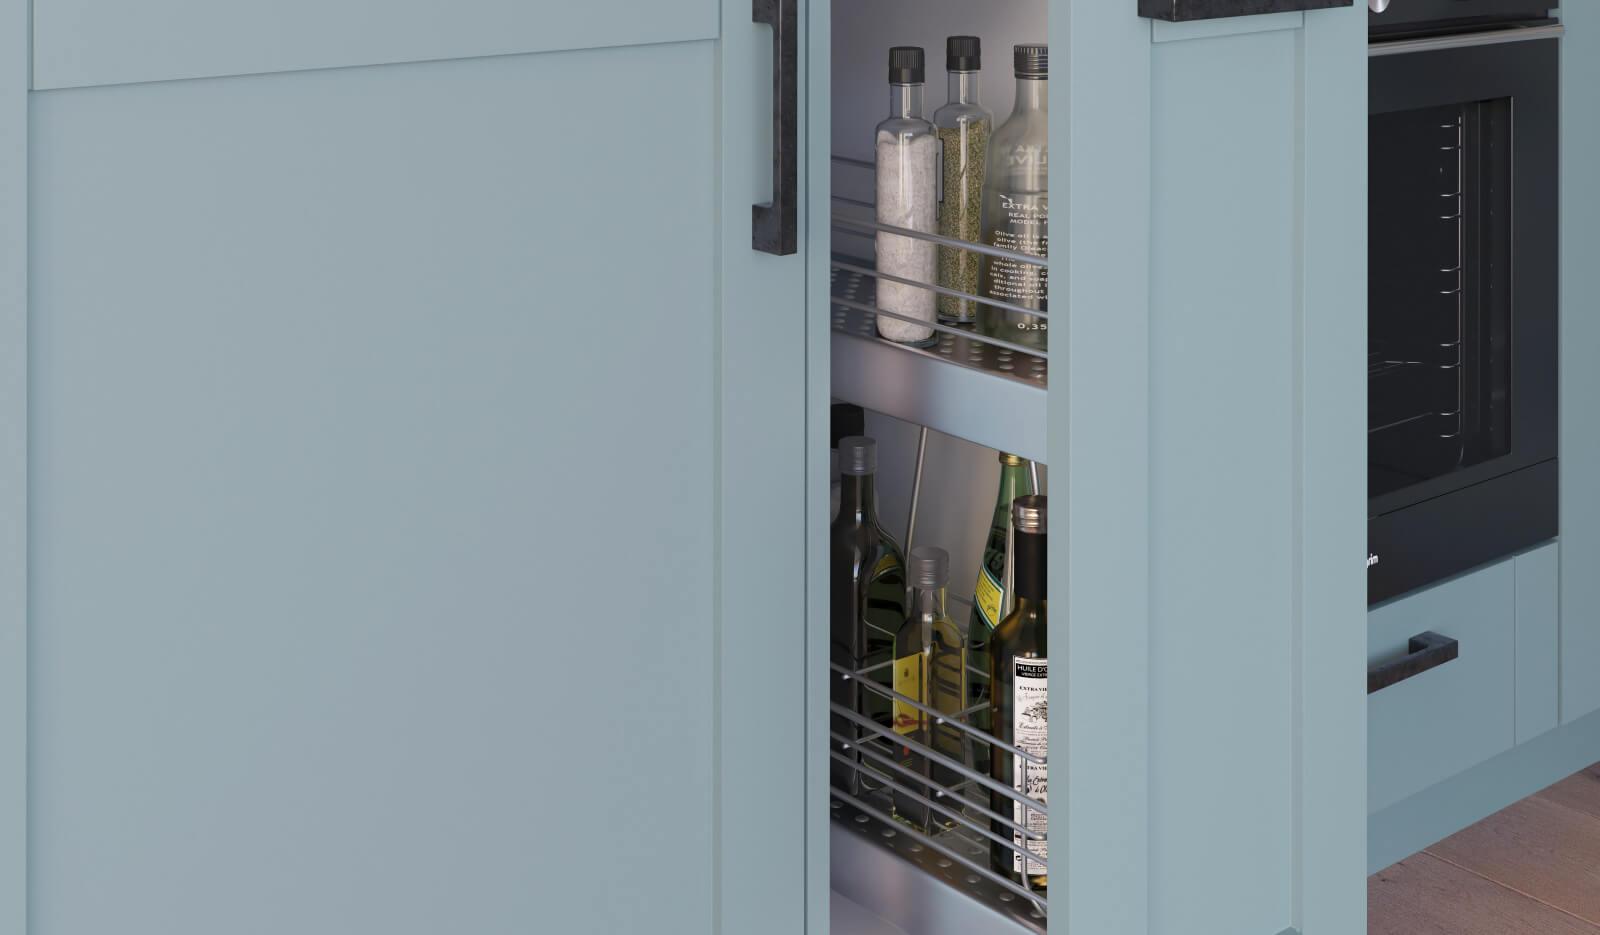 Keuken Romantiek NCS hemelsblauw - flessenkast